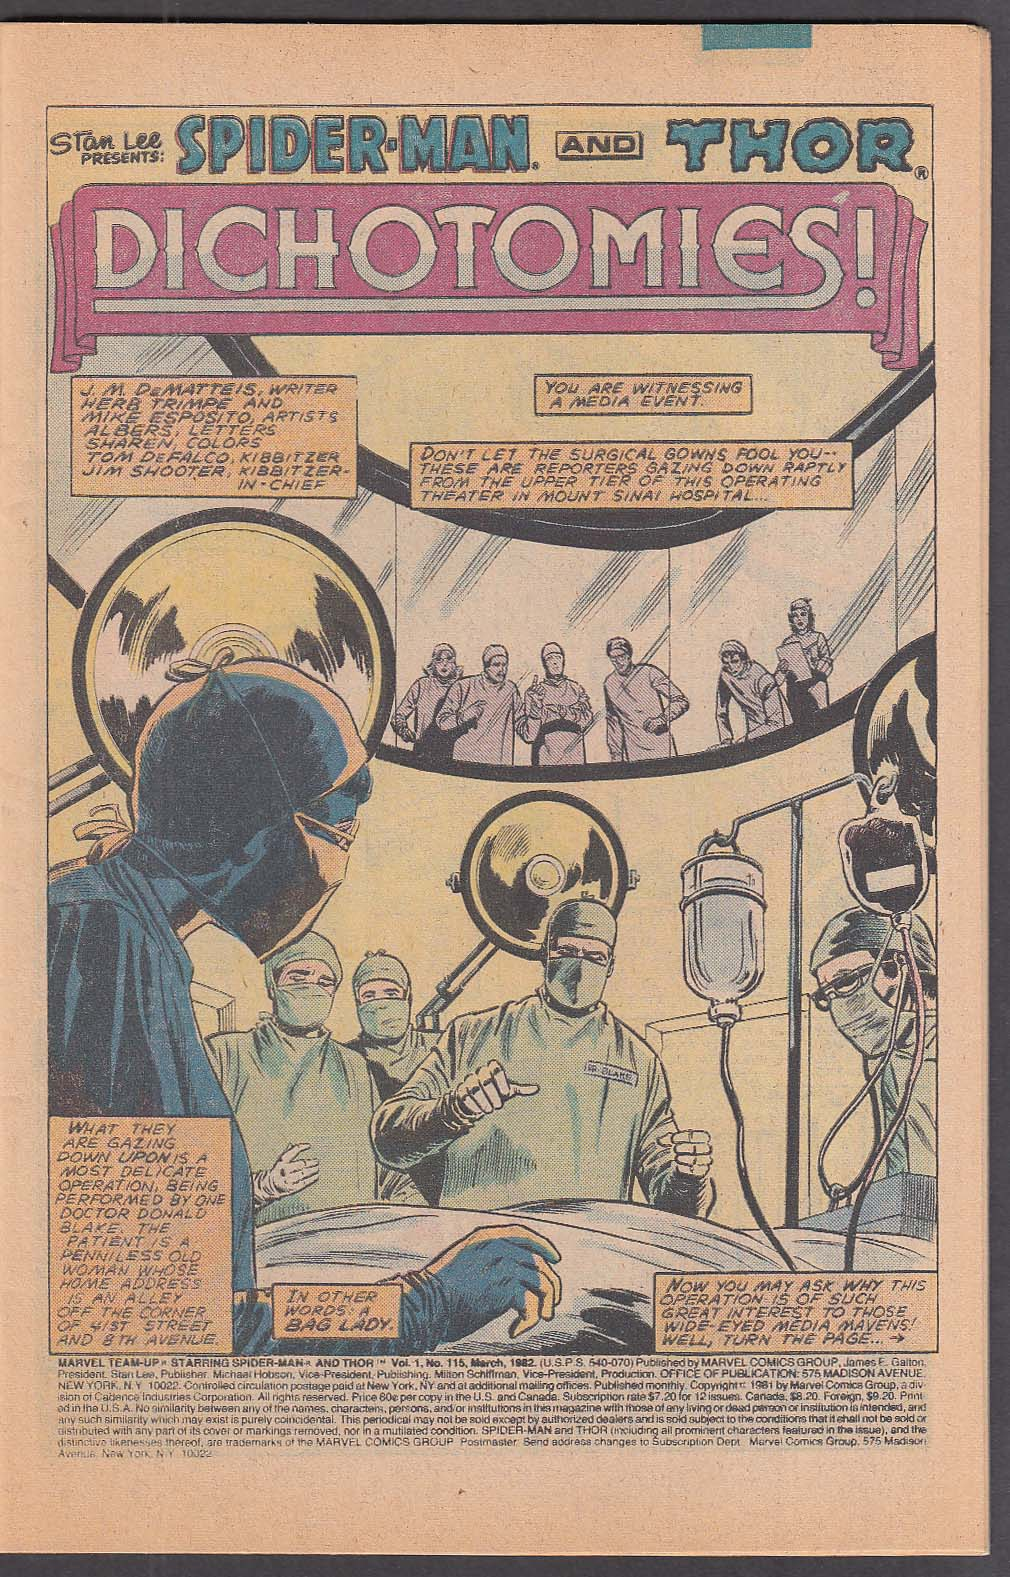 Image for MARVEL TEAM-UP #115 Spider-Man & Thor comic book 3 1982